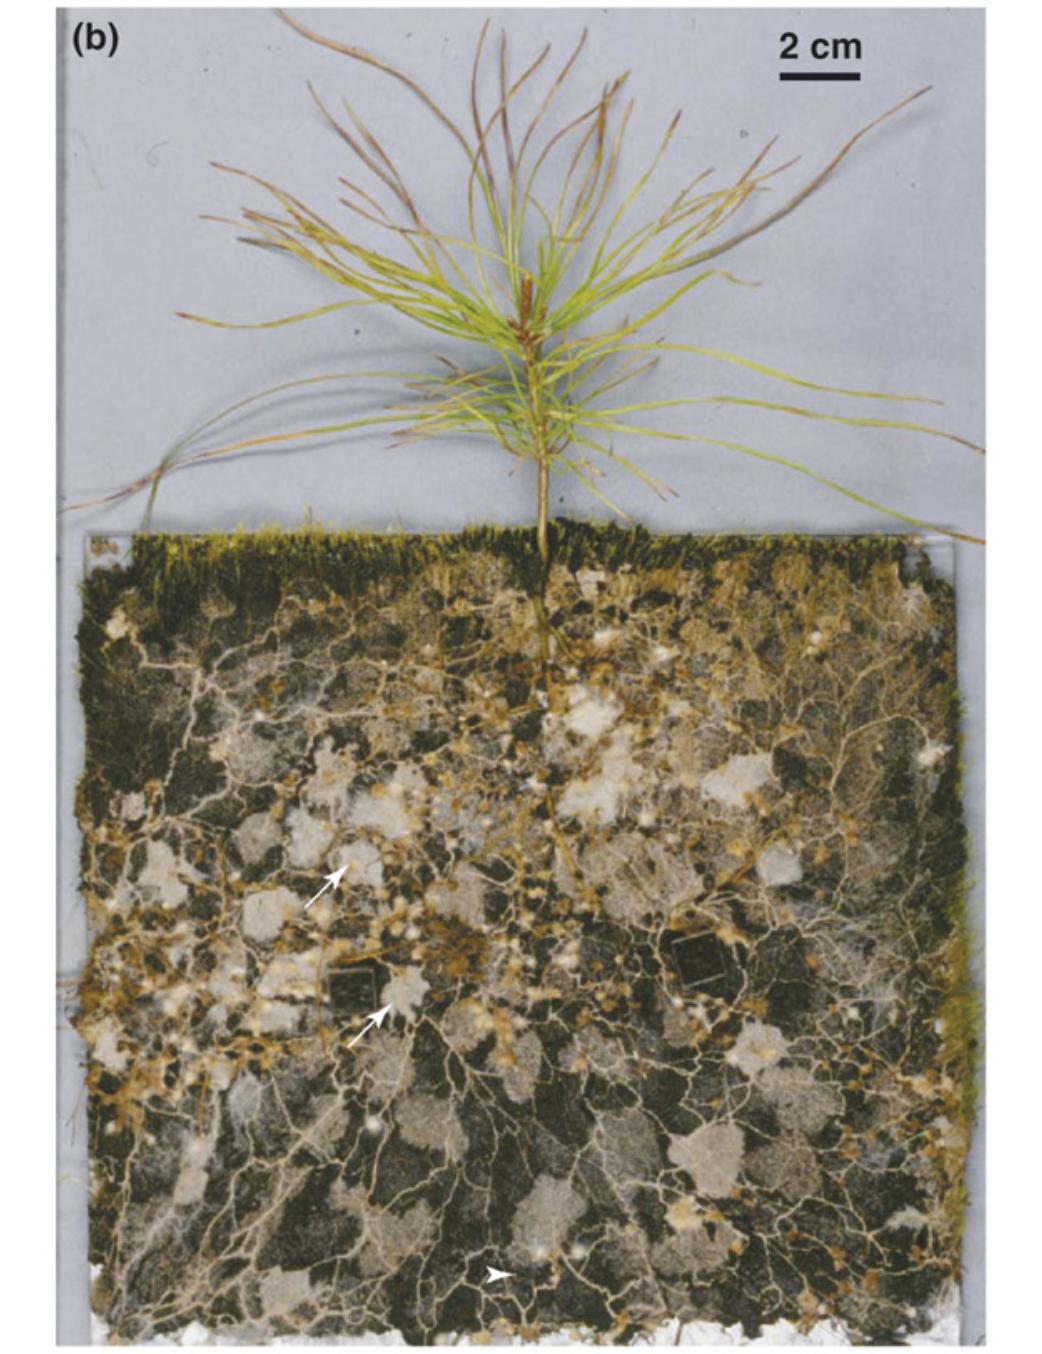 Pinus sylvestris  seedling growing with the ECM fungus  Suillus bovinus  Lambers et al. 2008